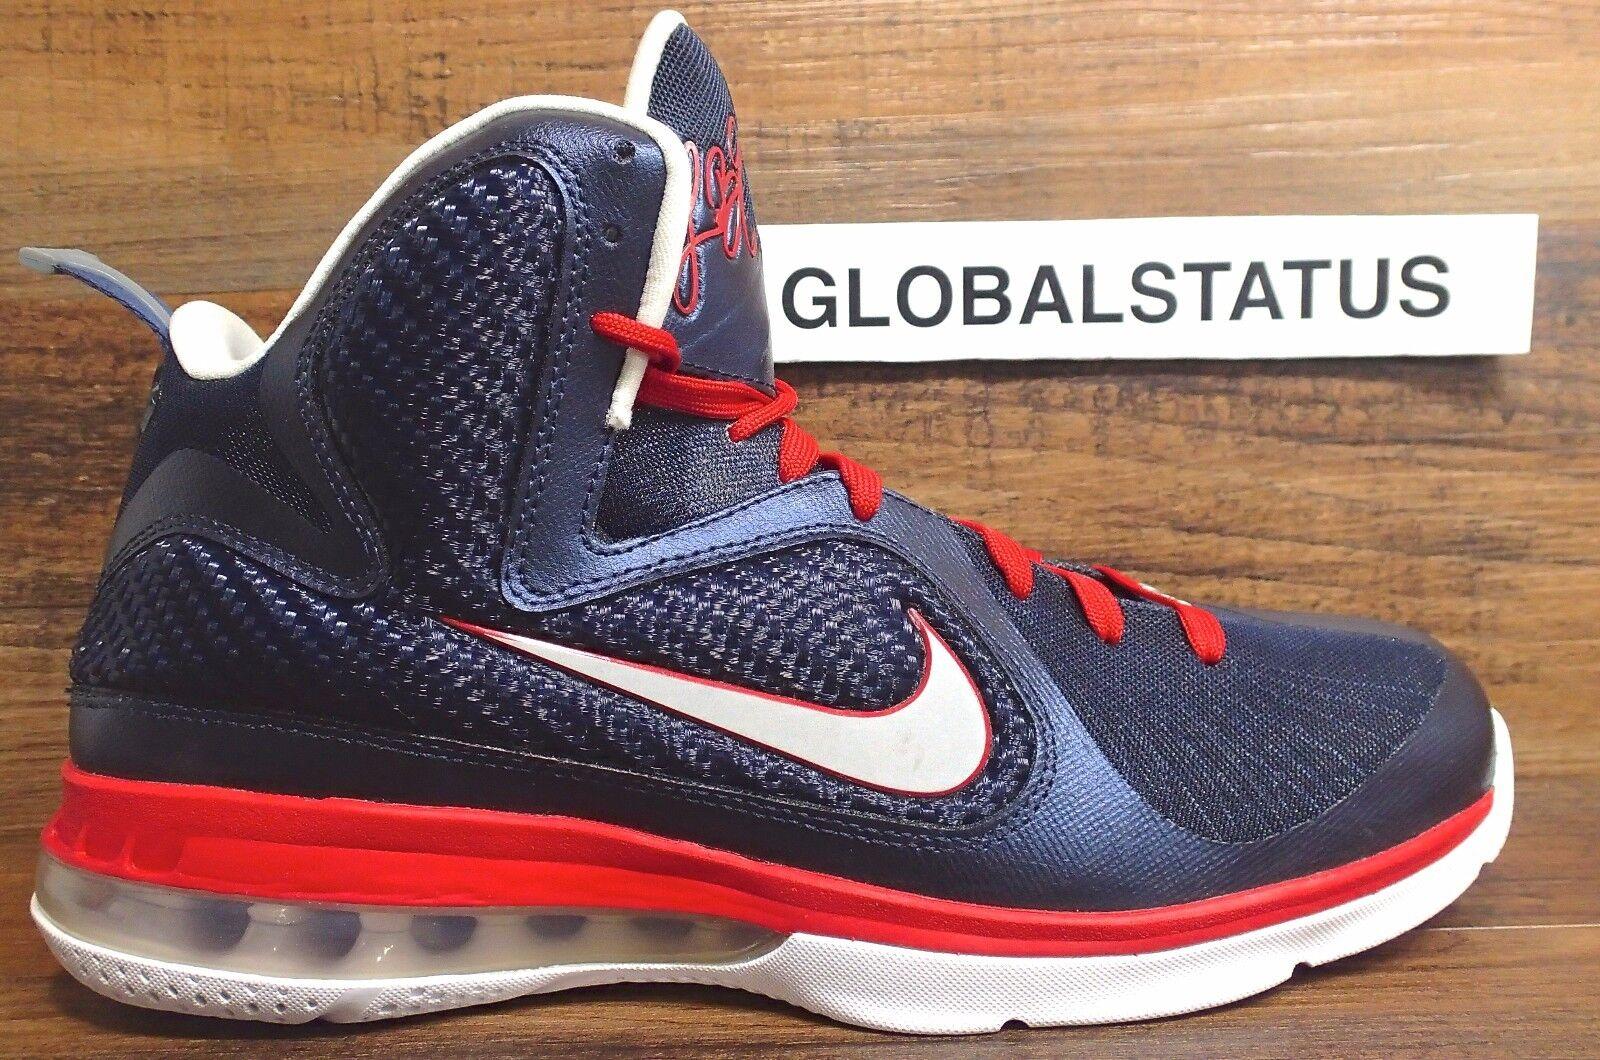 2011 - id Uomo lebron 9 usa olympic blu, scarpe da basket 512132 991 sz 10